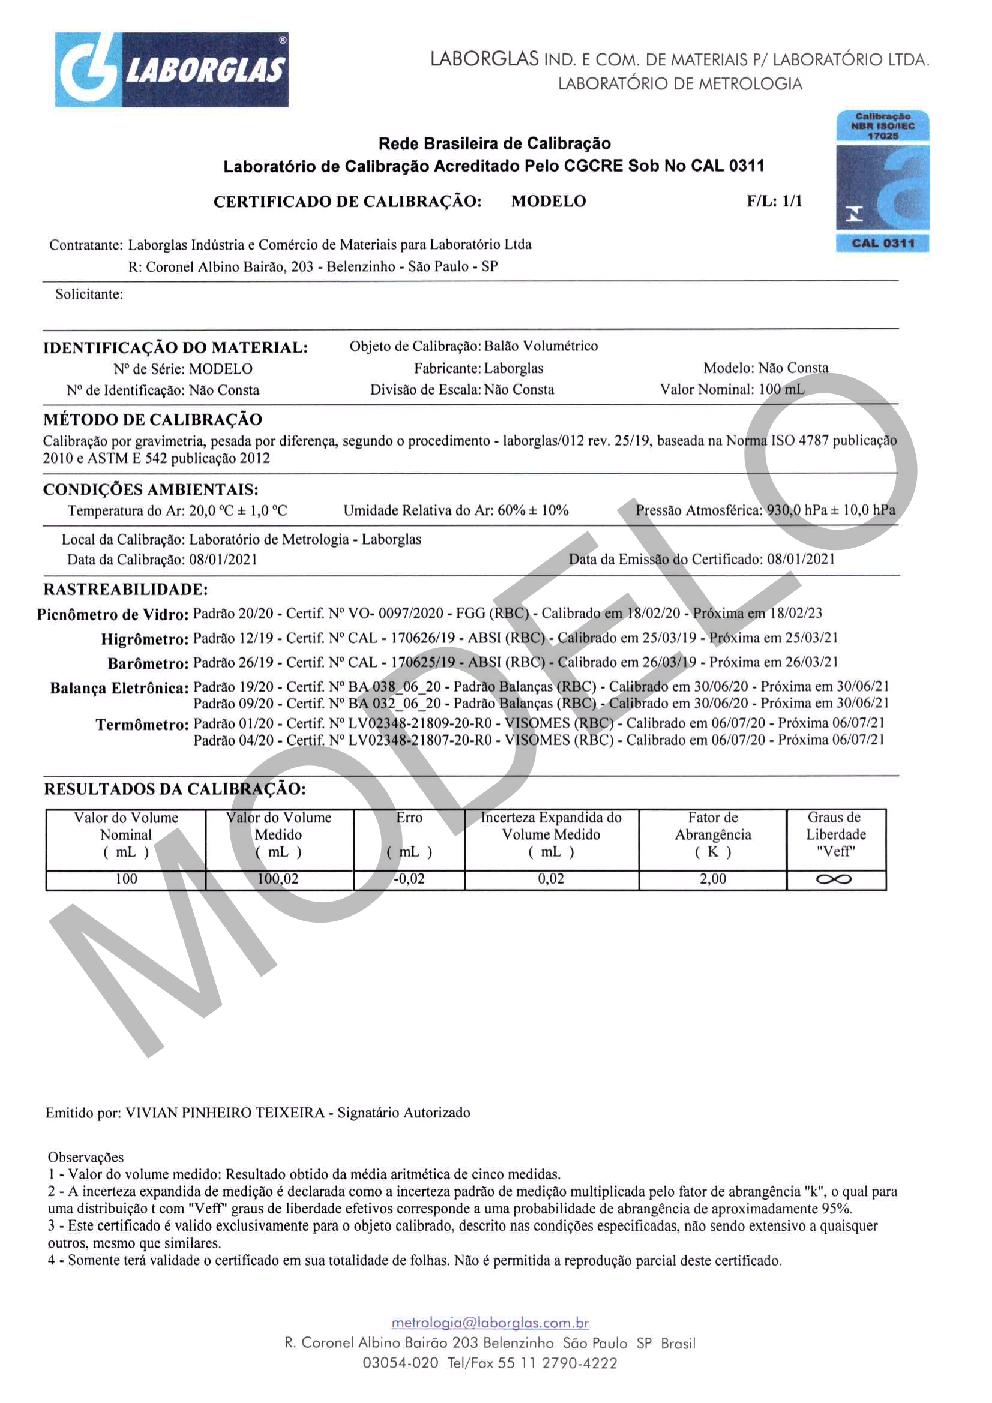 BALÃO VOLUMÉTRICO CLASSE A ROLHA POLI C/ CERTIFICADO RBC 5 ML - Marca Laborglas - Cód. 9167807-R